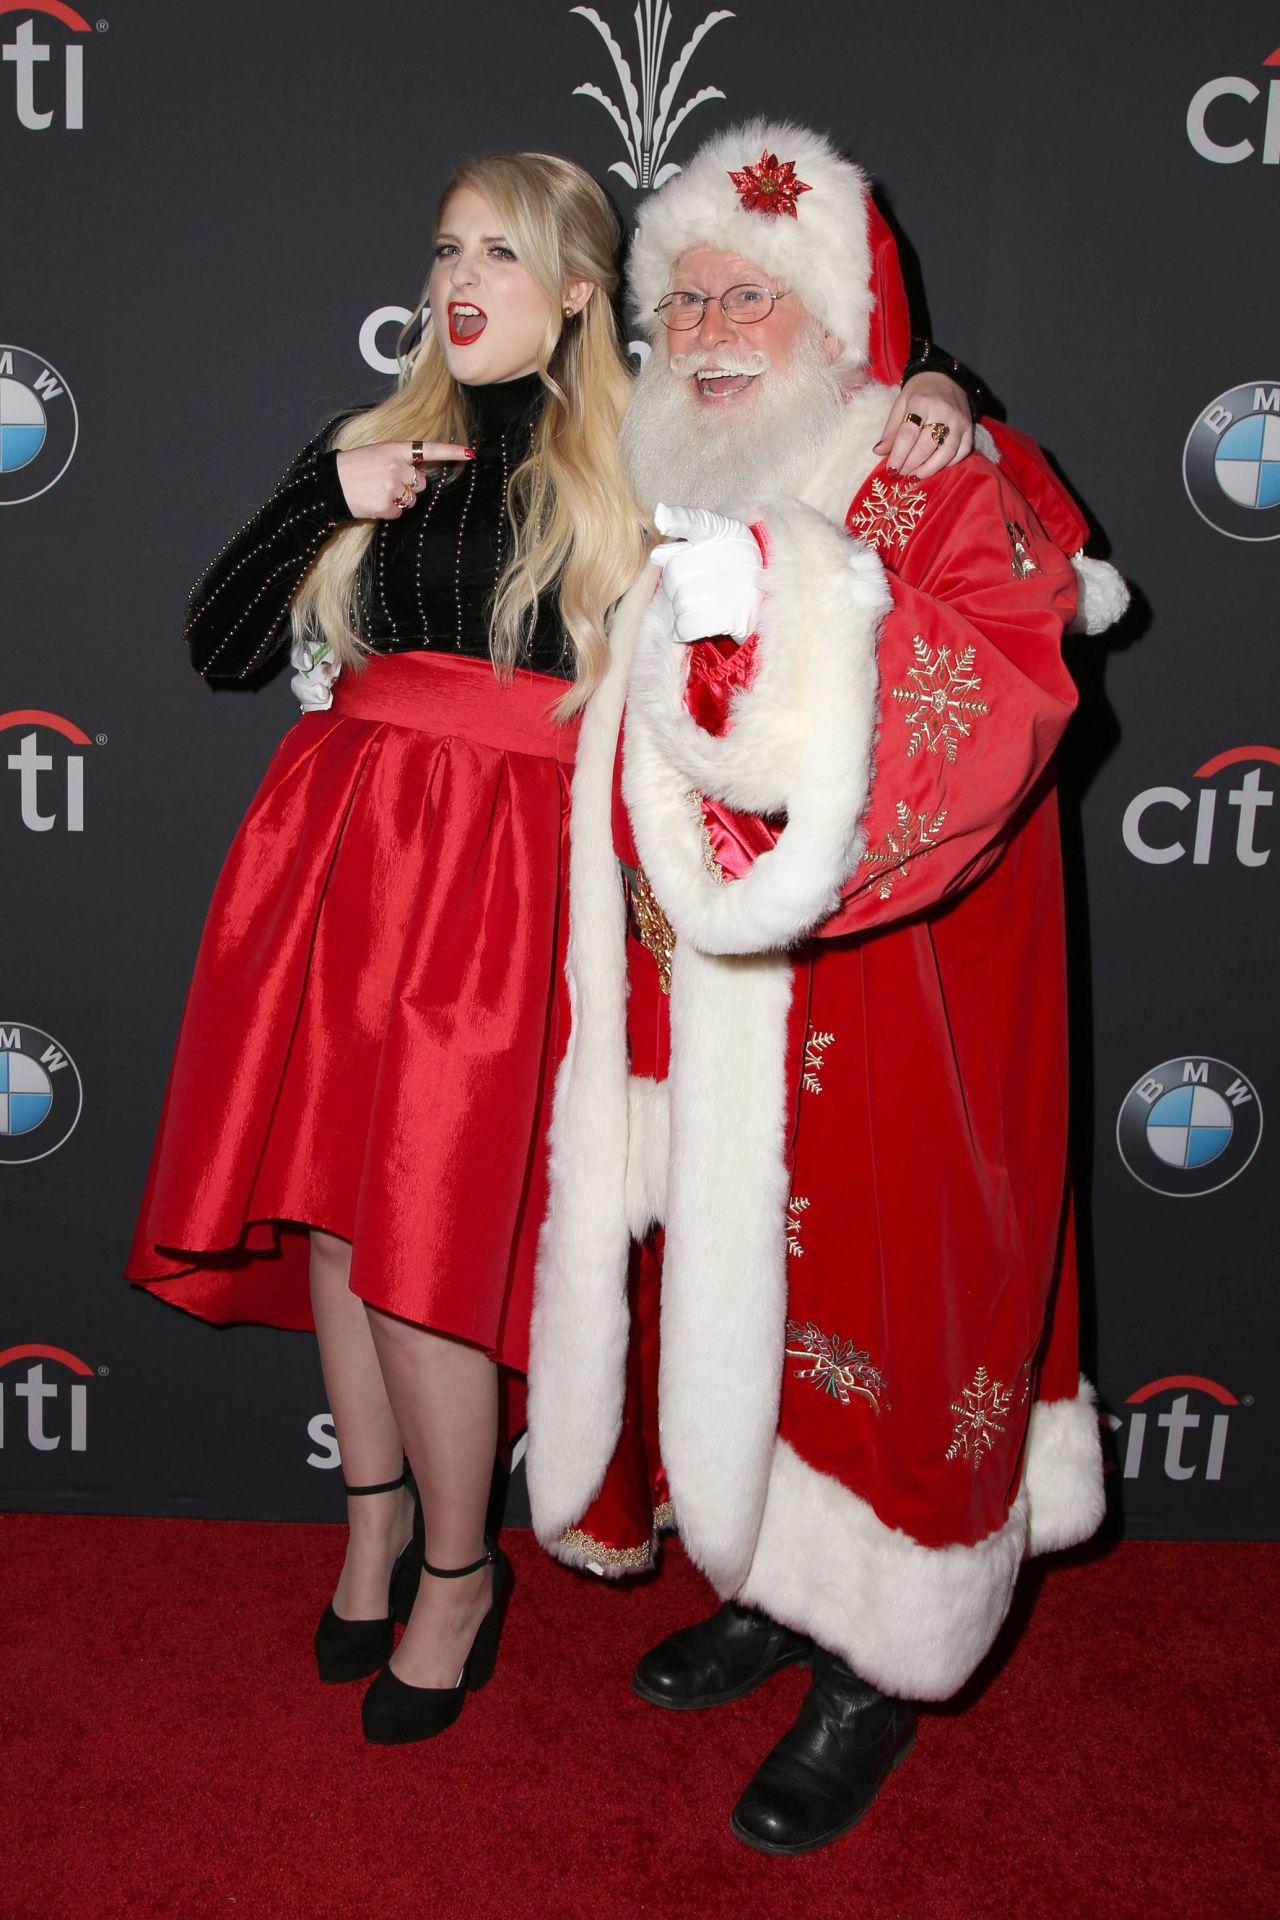 Trainor - The Grove Christmas With Seth MacFarlane in Los Angeles